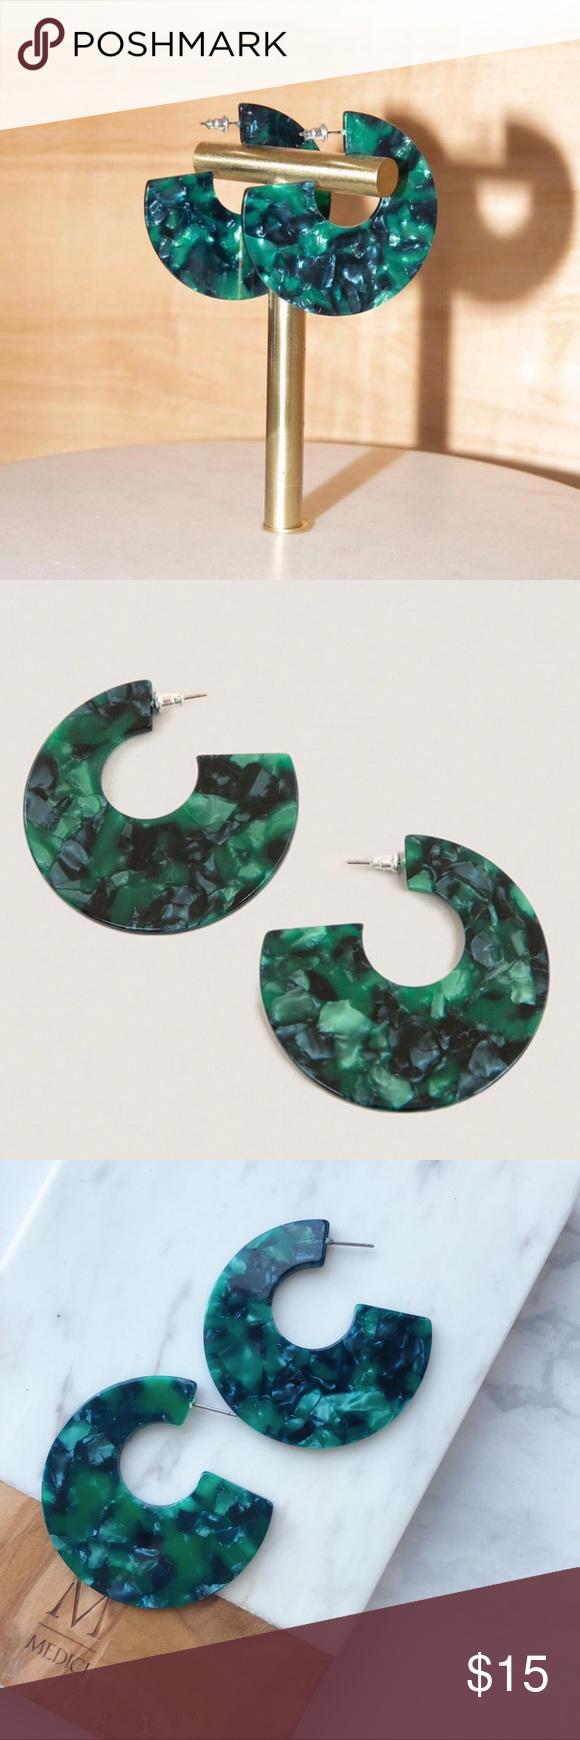 414428b21f6 Emerald Tortoise Statement Earrings Brand new. Color  Green Each has its  unique pattern Jewelry Earrings